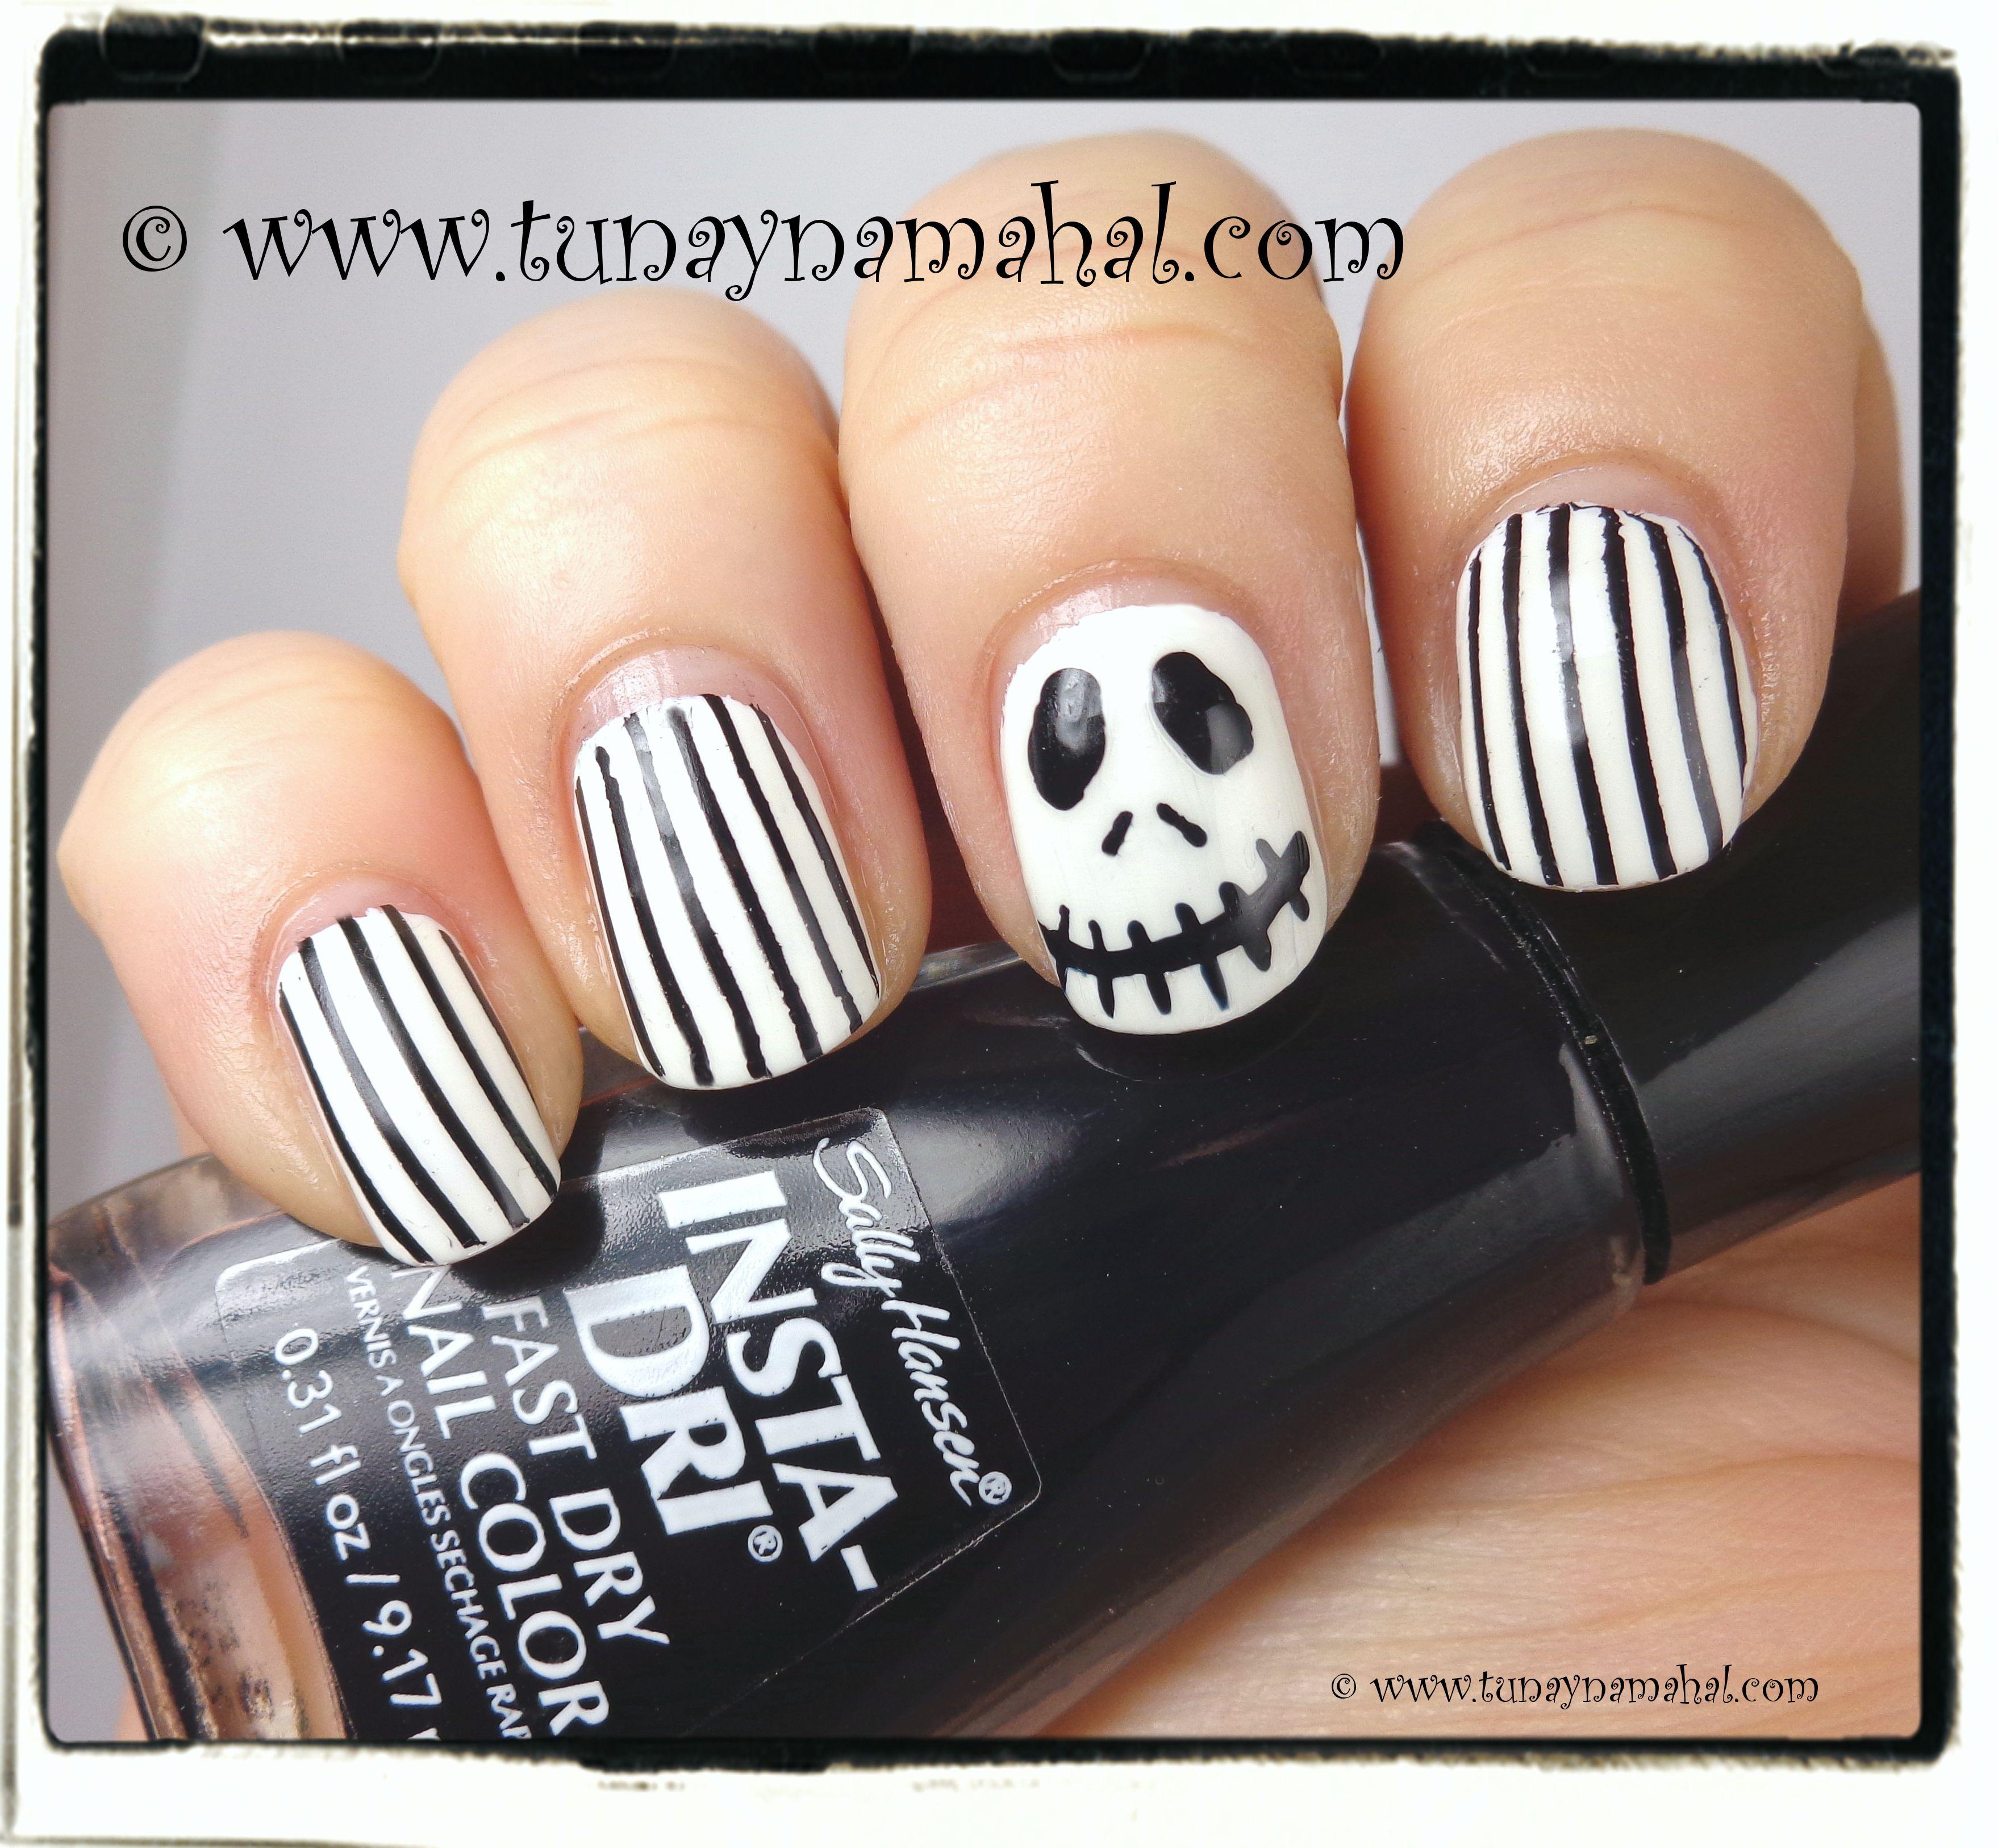 Funky Jack Skellington Nails Photo - Nail Art Ideas - morihati.com